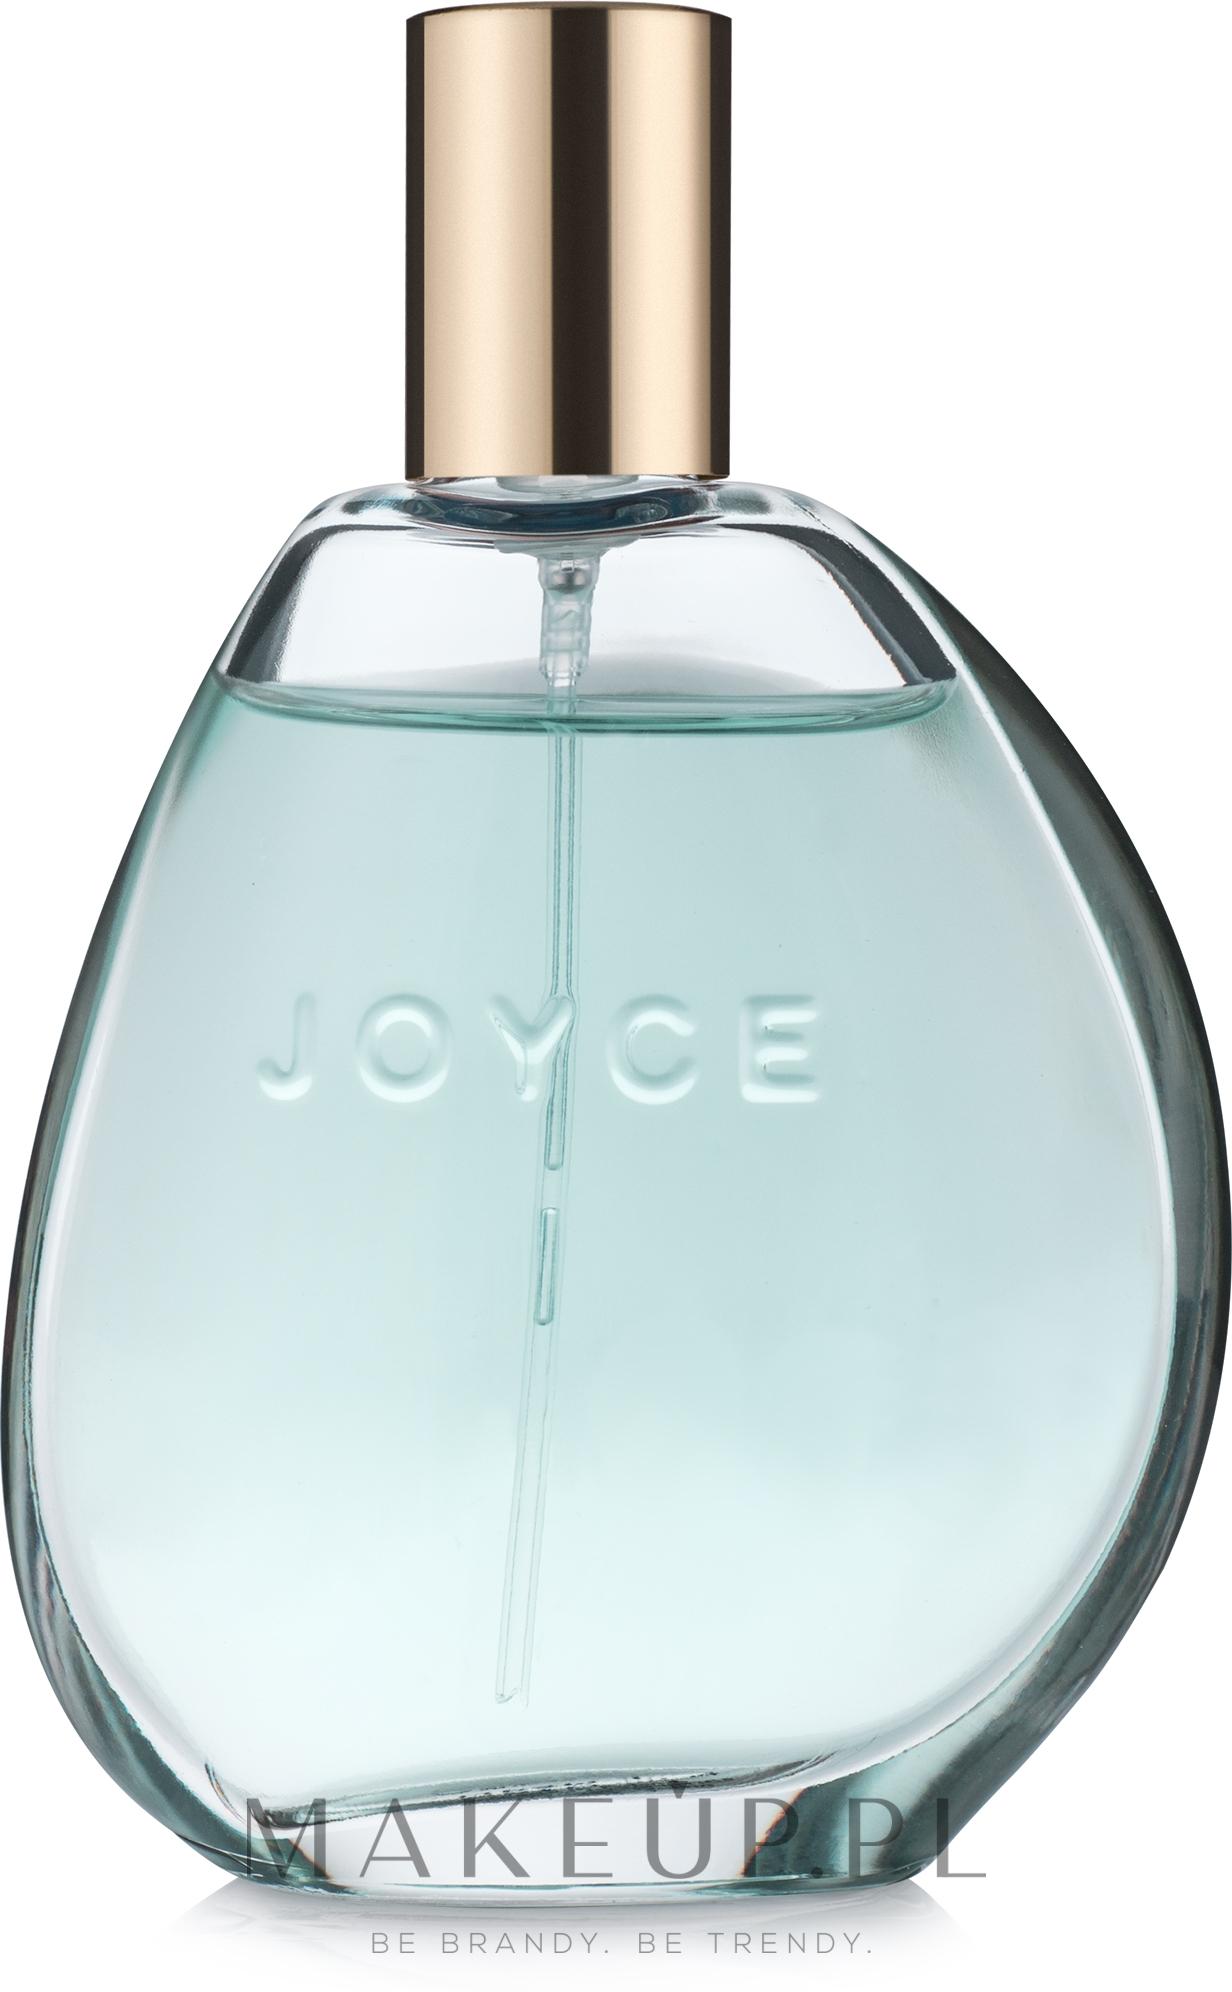 oriflame joyce turquoise